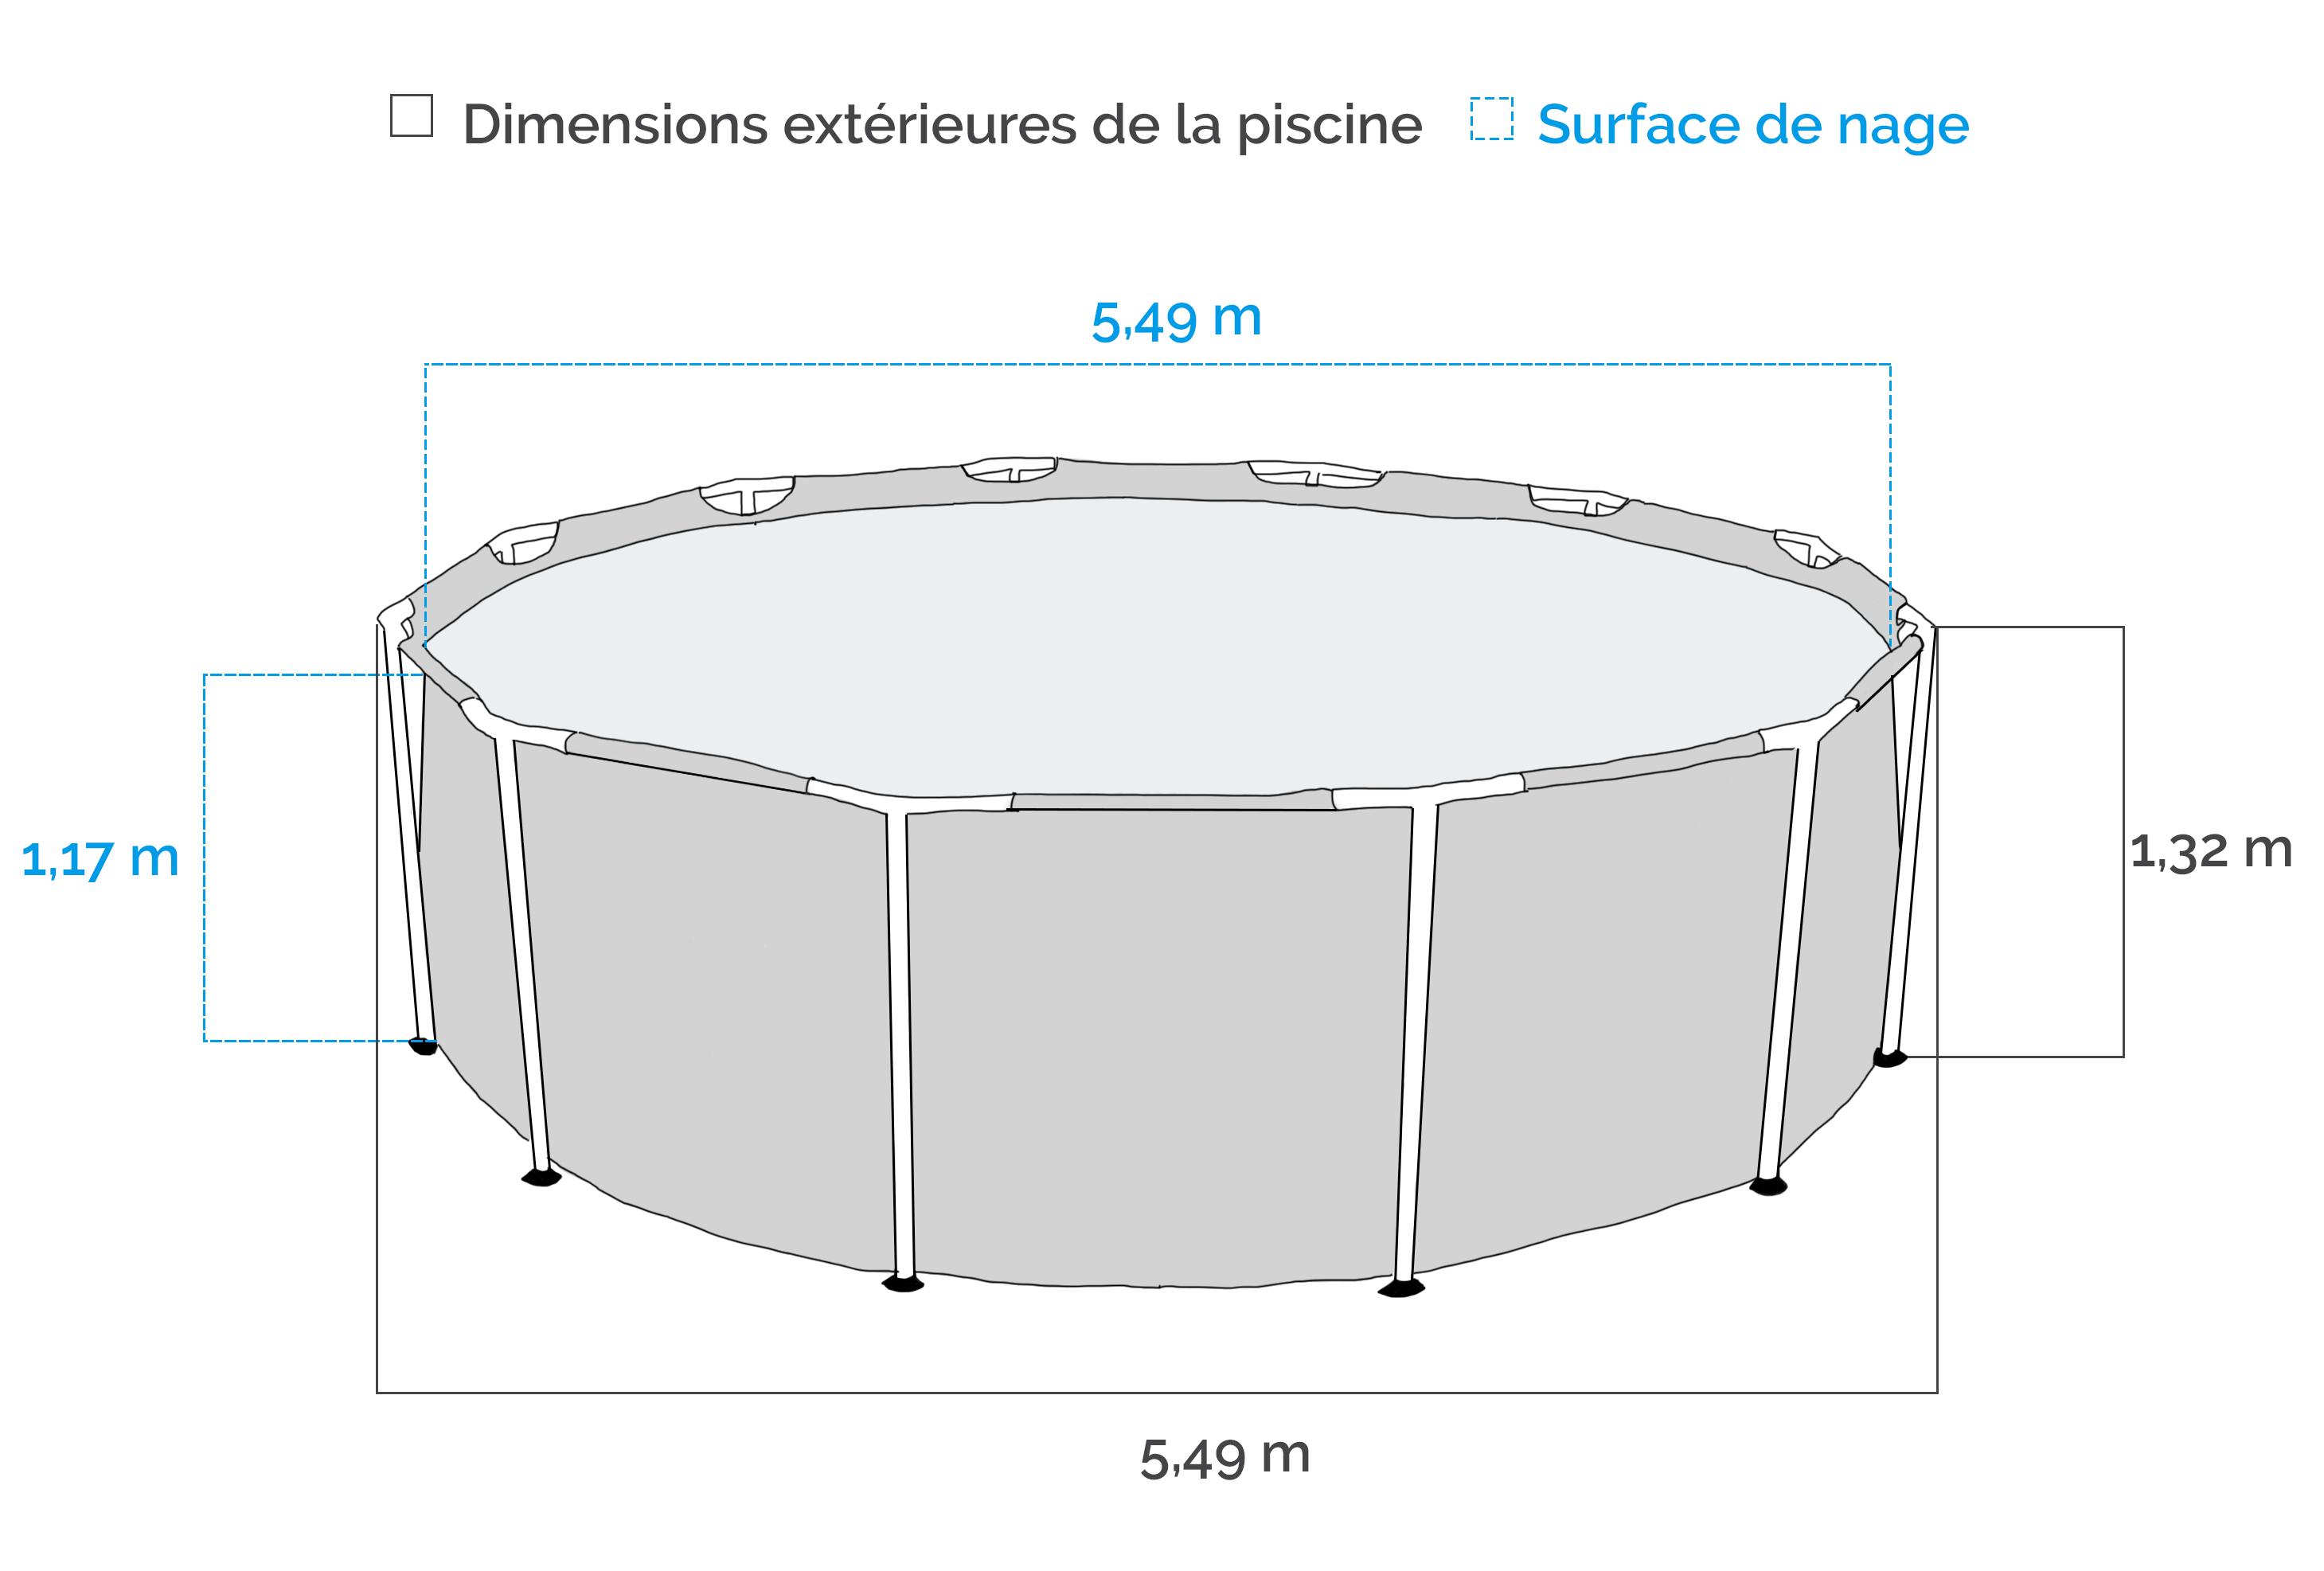 Dimensions de la Piscine tubulaire Intex Ultra Frame 5.49 x 1.32 m